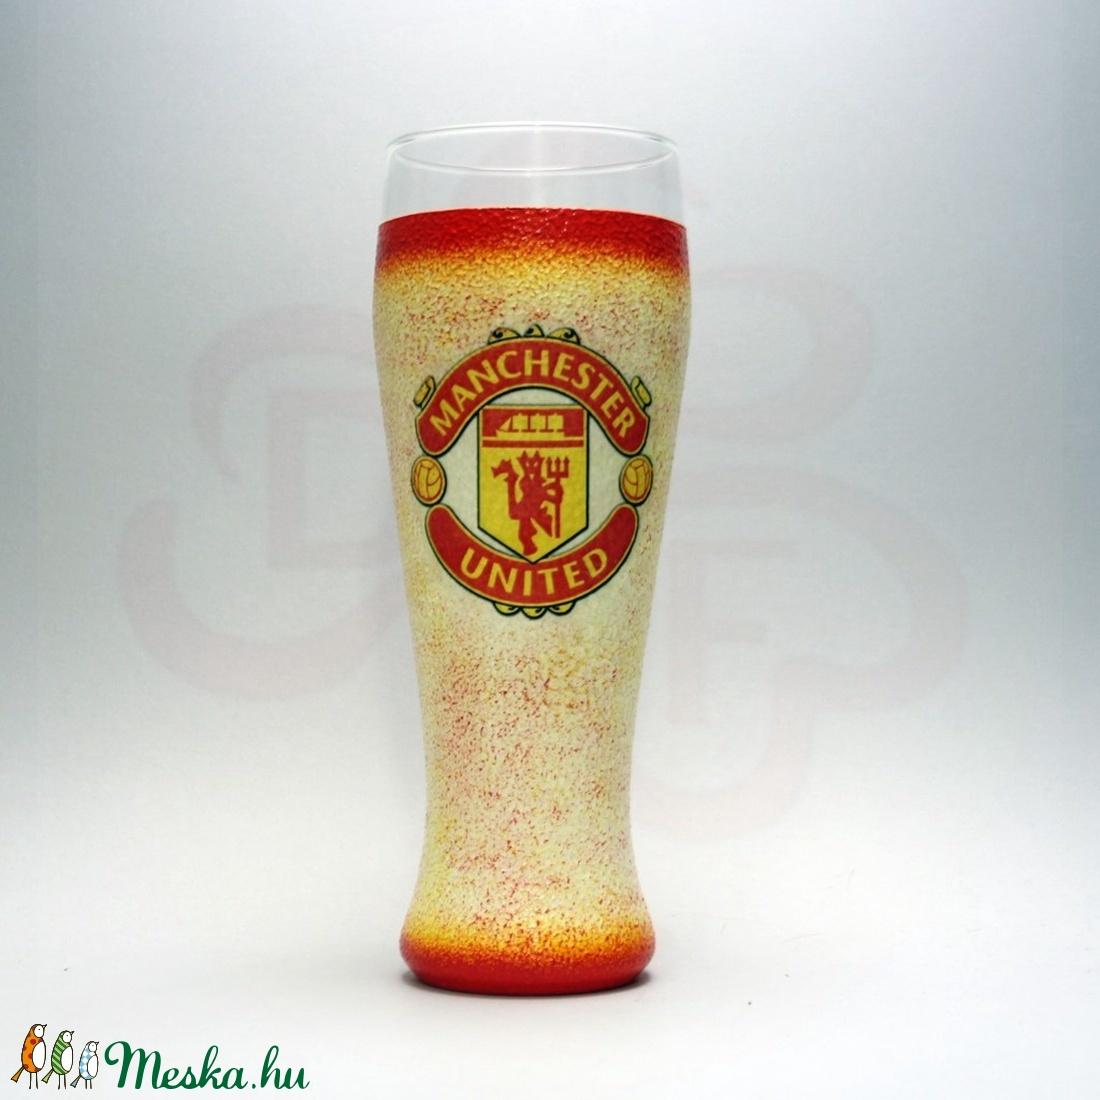 Manchester United sörös pohár; futball szurkolóknak - Meska.hu